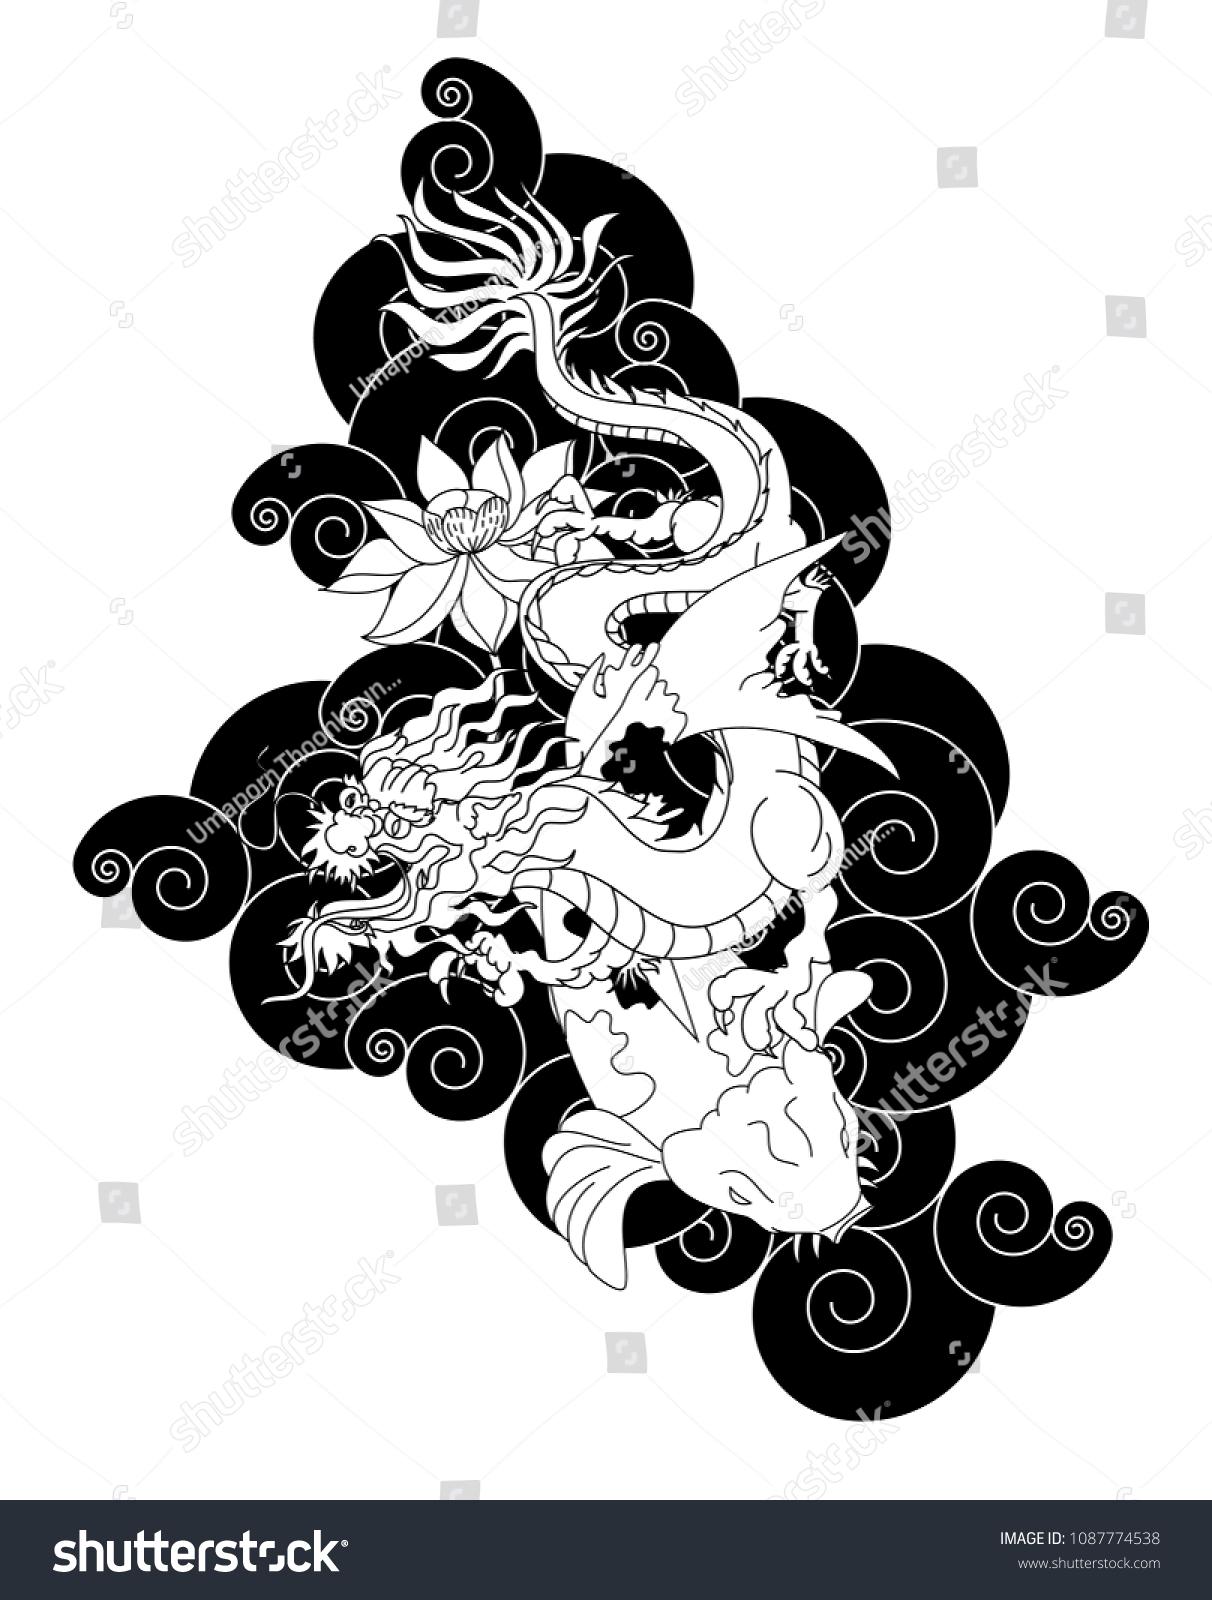 Japanese dragon koi carp lotus flower stock vector royalty free japanese dragon and koi carp with lotus flower on cloud backgroundlorful chinese tattoo design izmirmasajfo